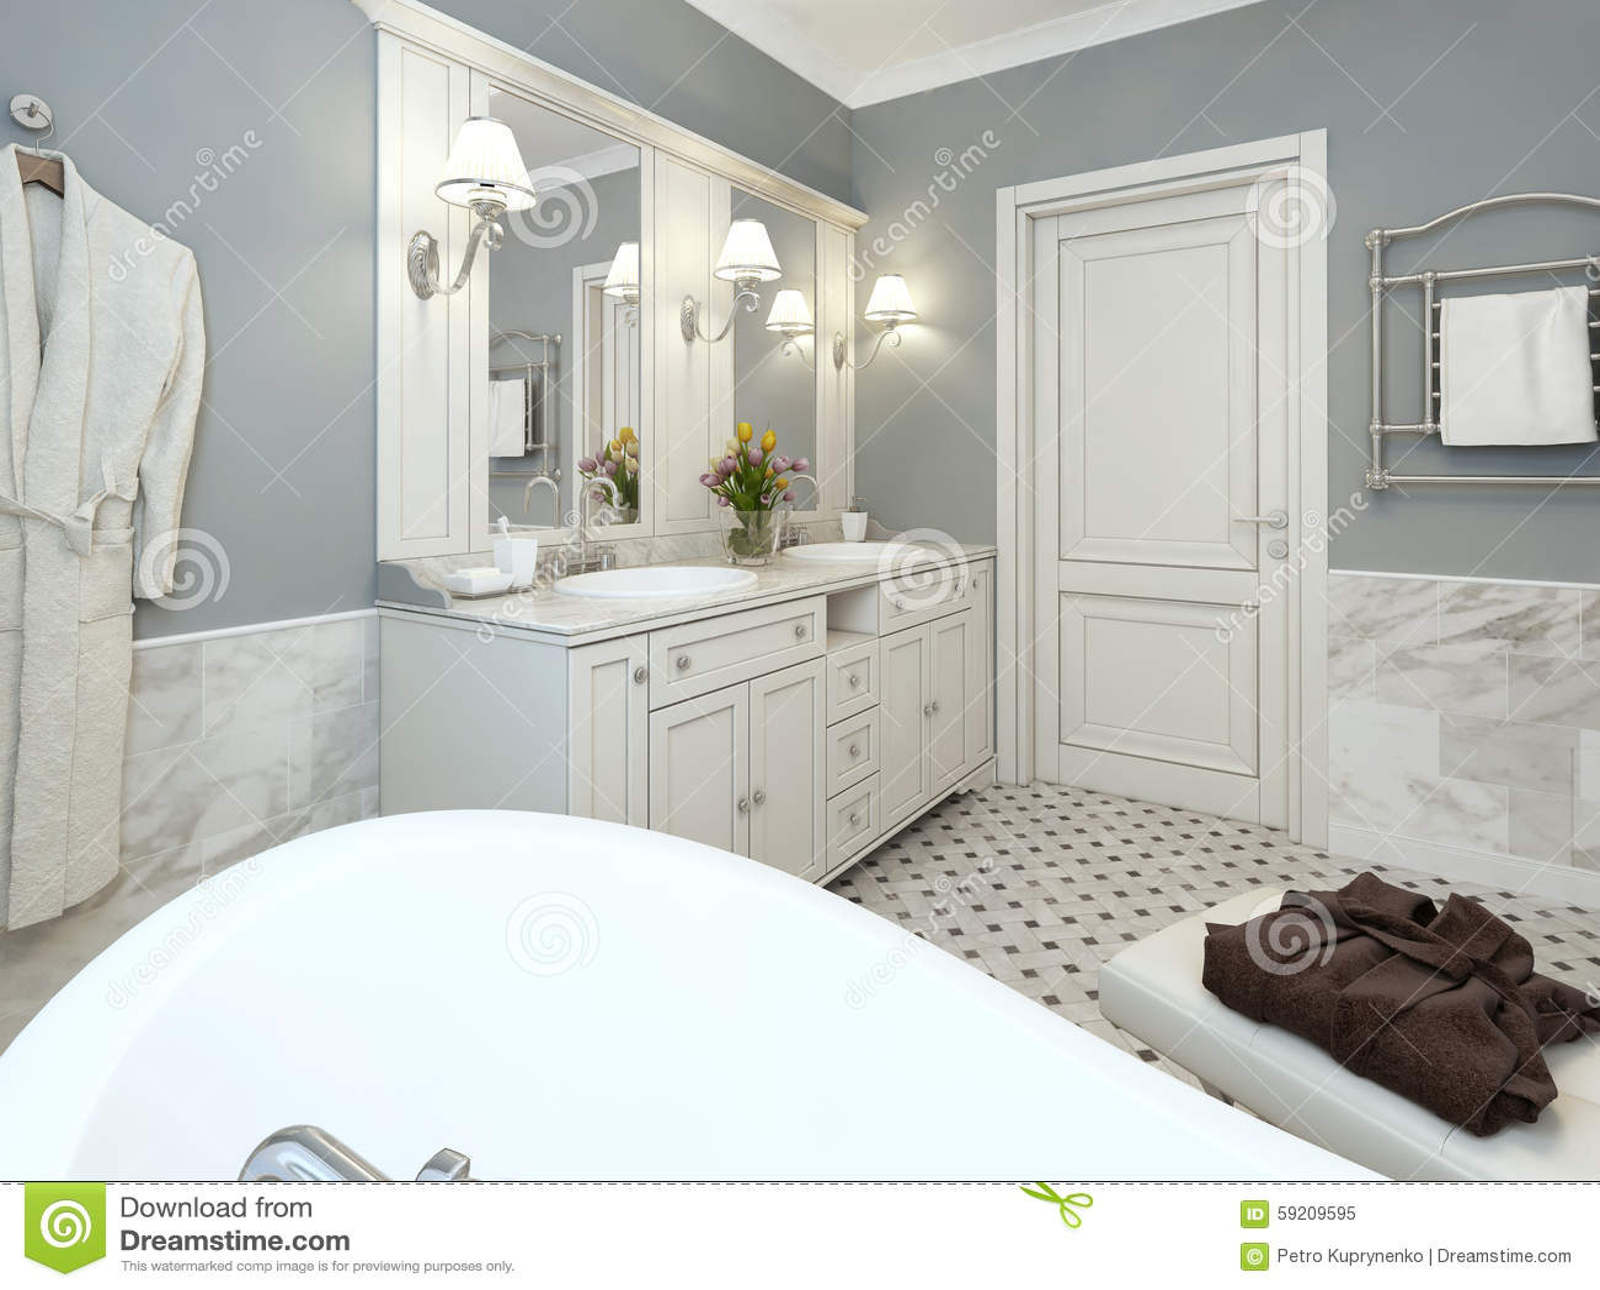 Helles Badezimmer Provence stockbild. Bild von leuchten - 59209595